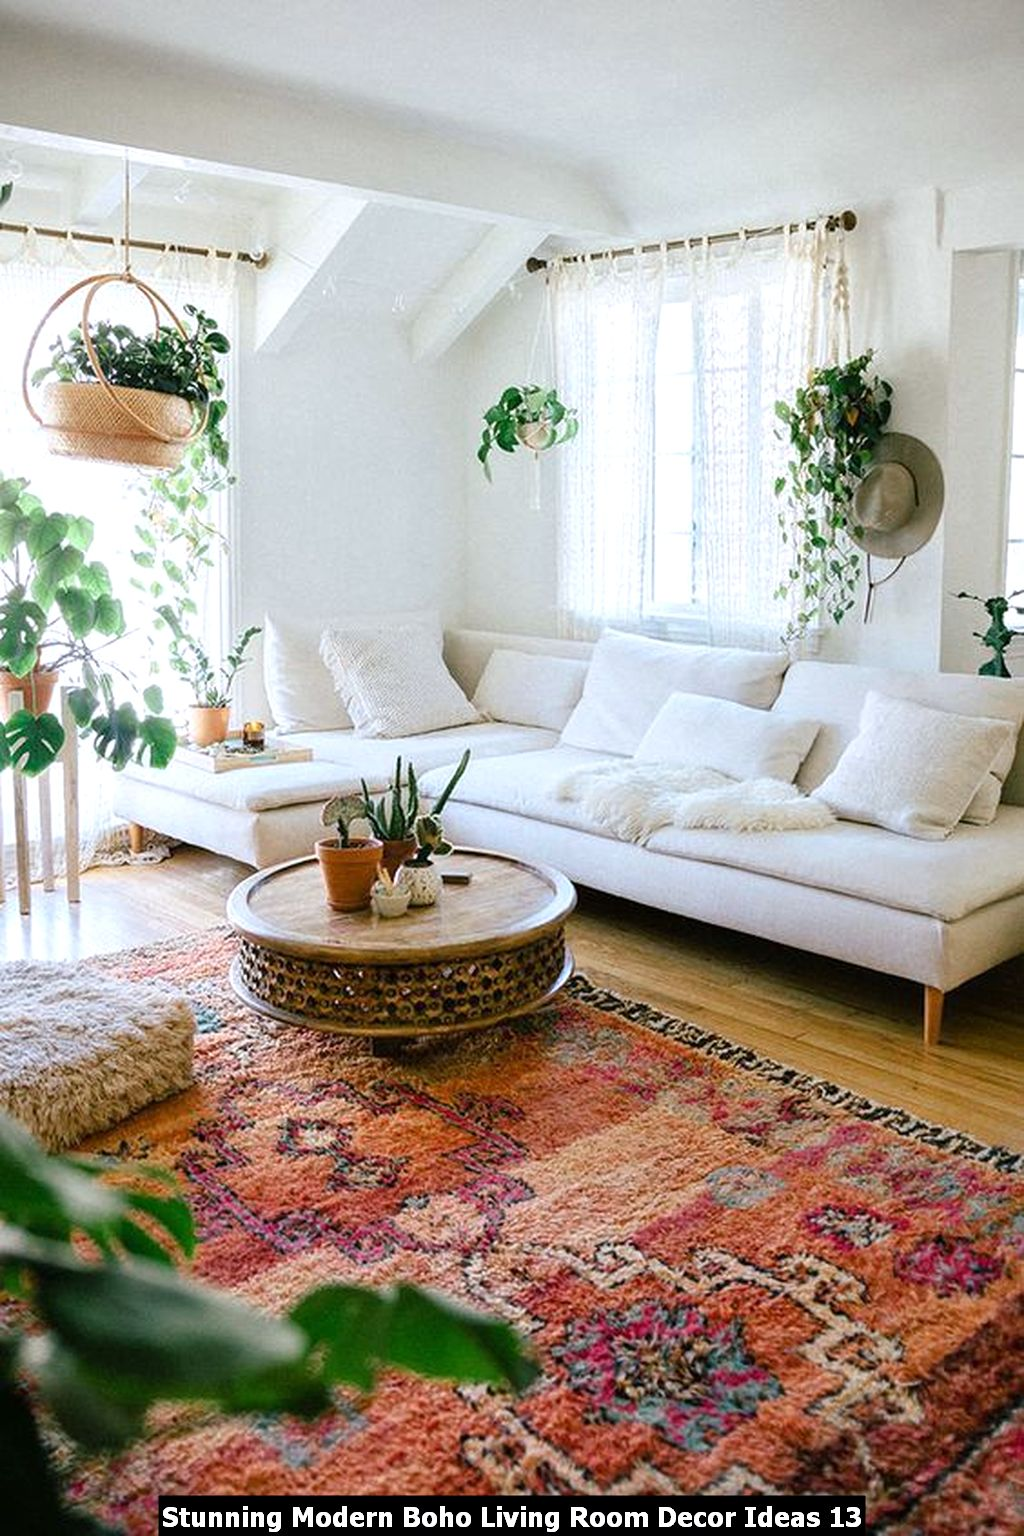 Stunning Modern Boho Living Room Decor Ideas 13